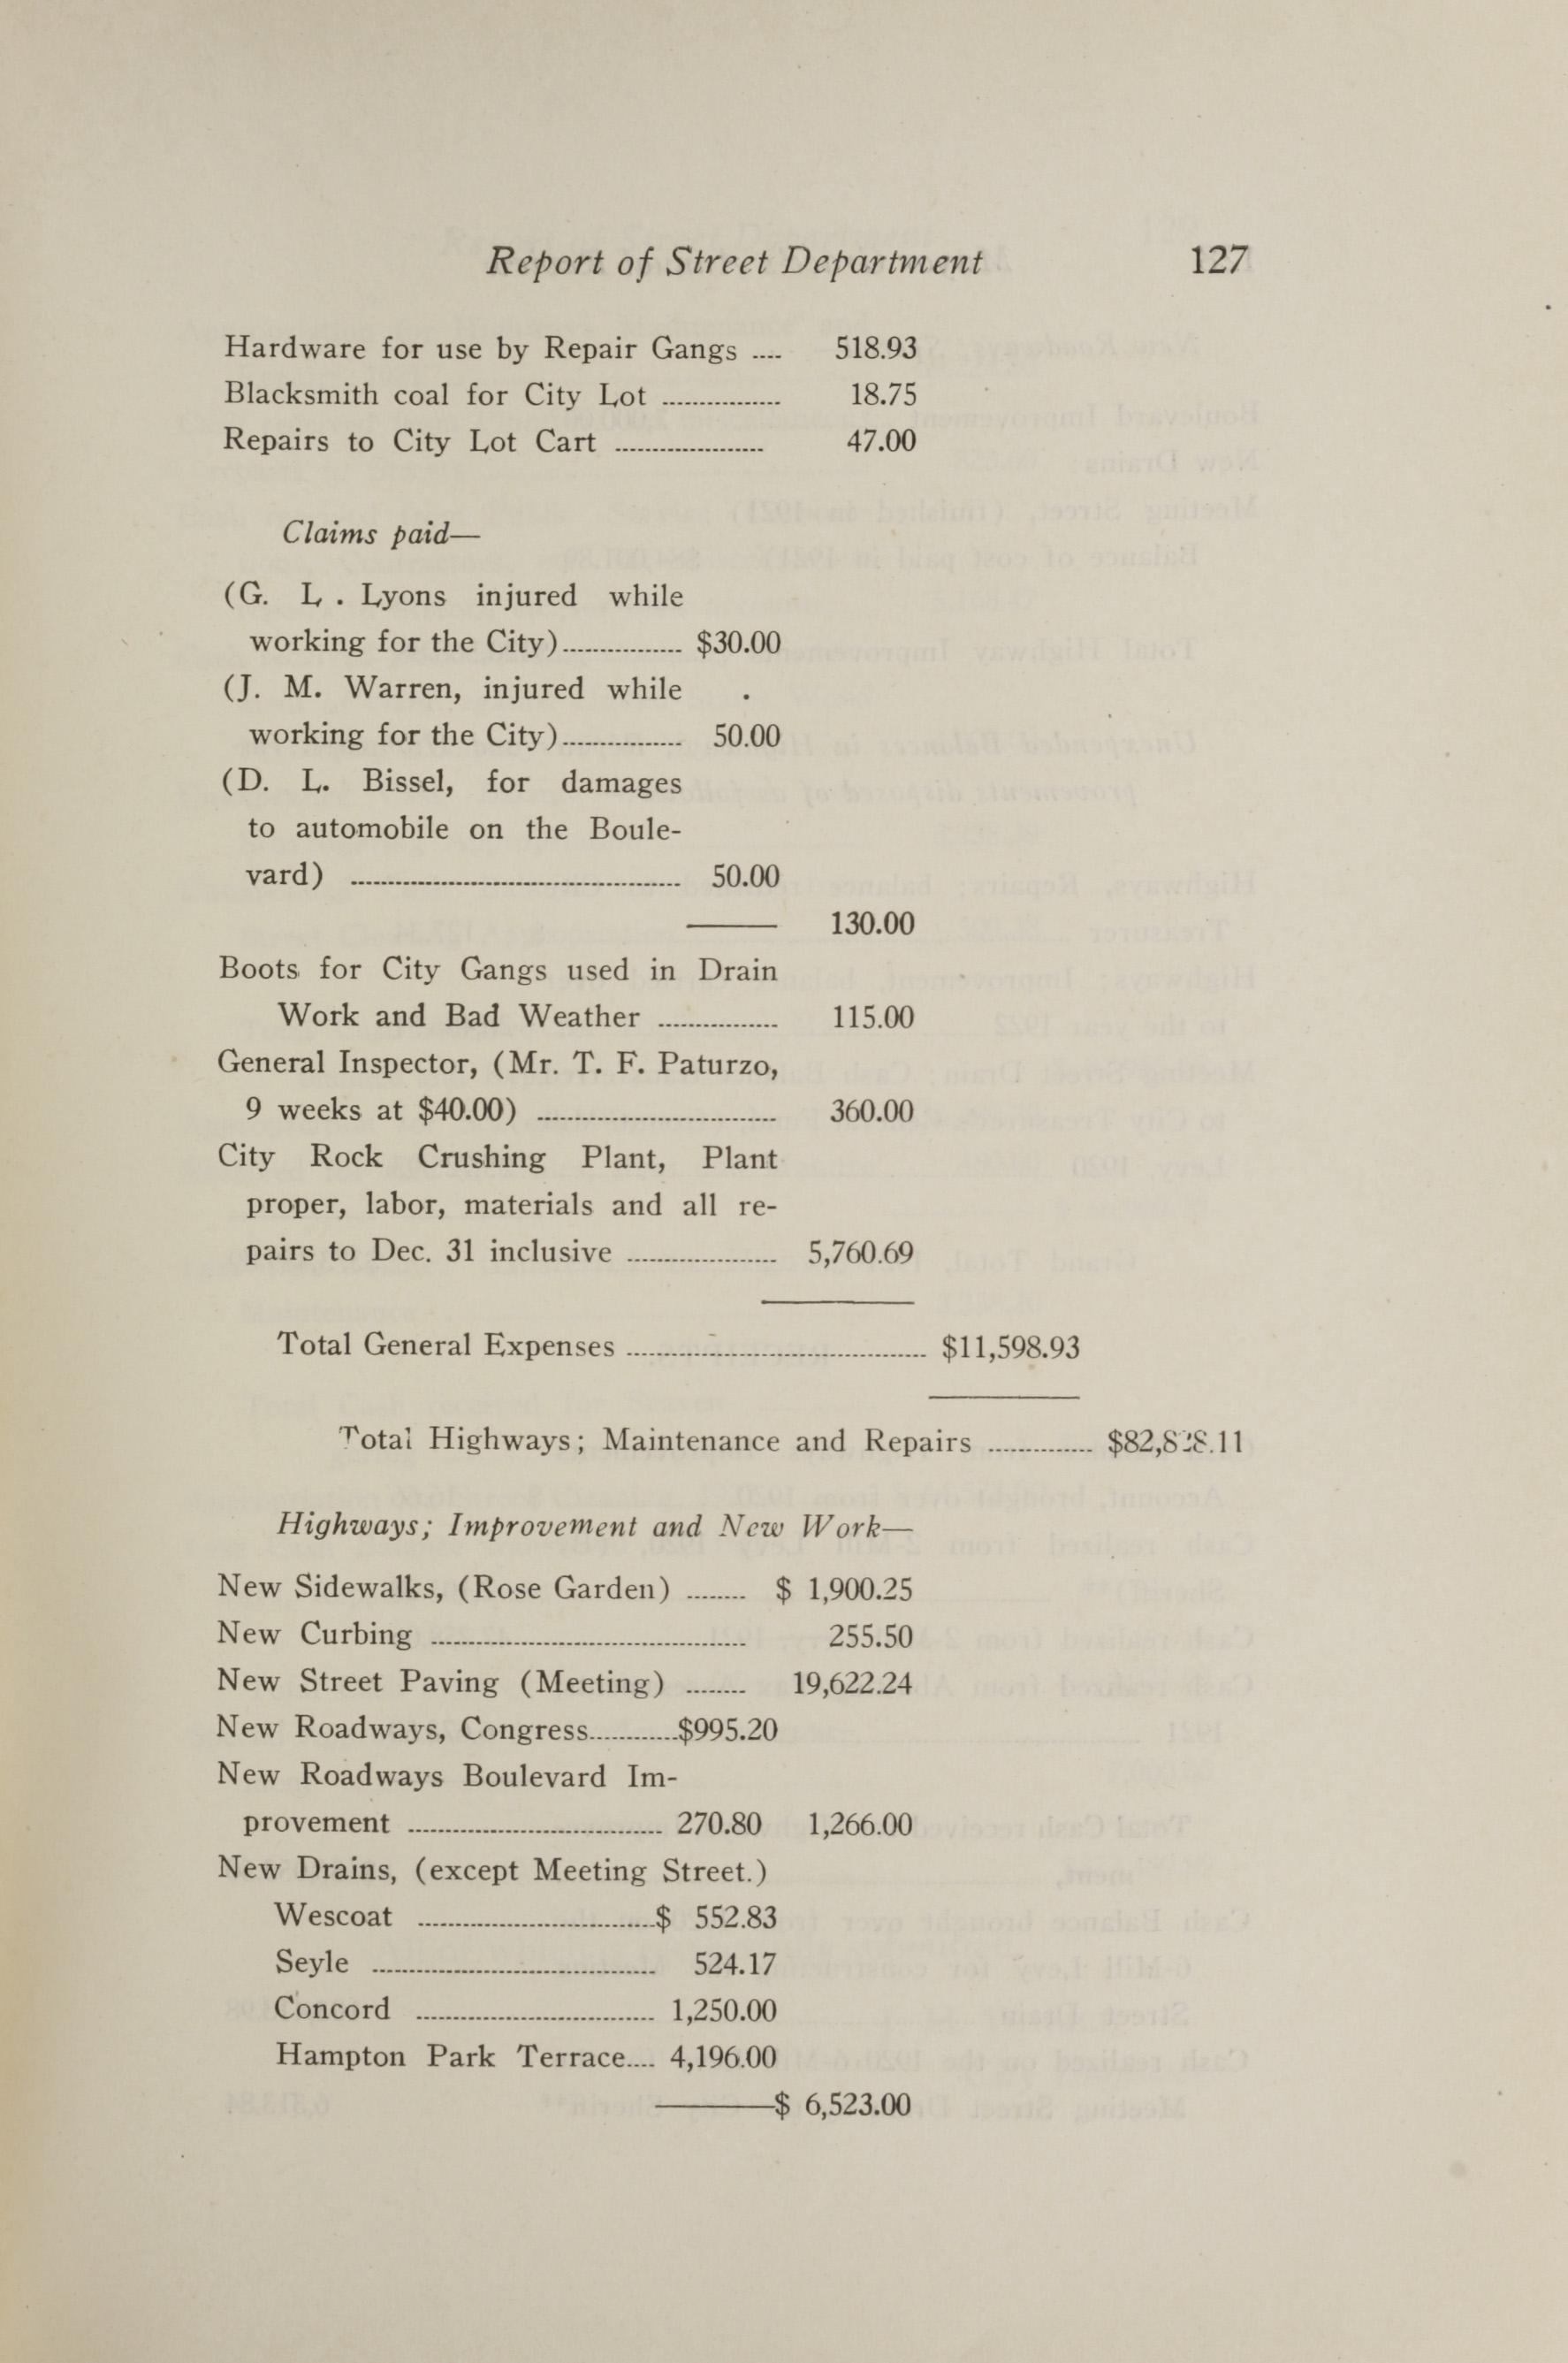 Charleston Yearbook, 1921, page 127